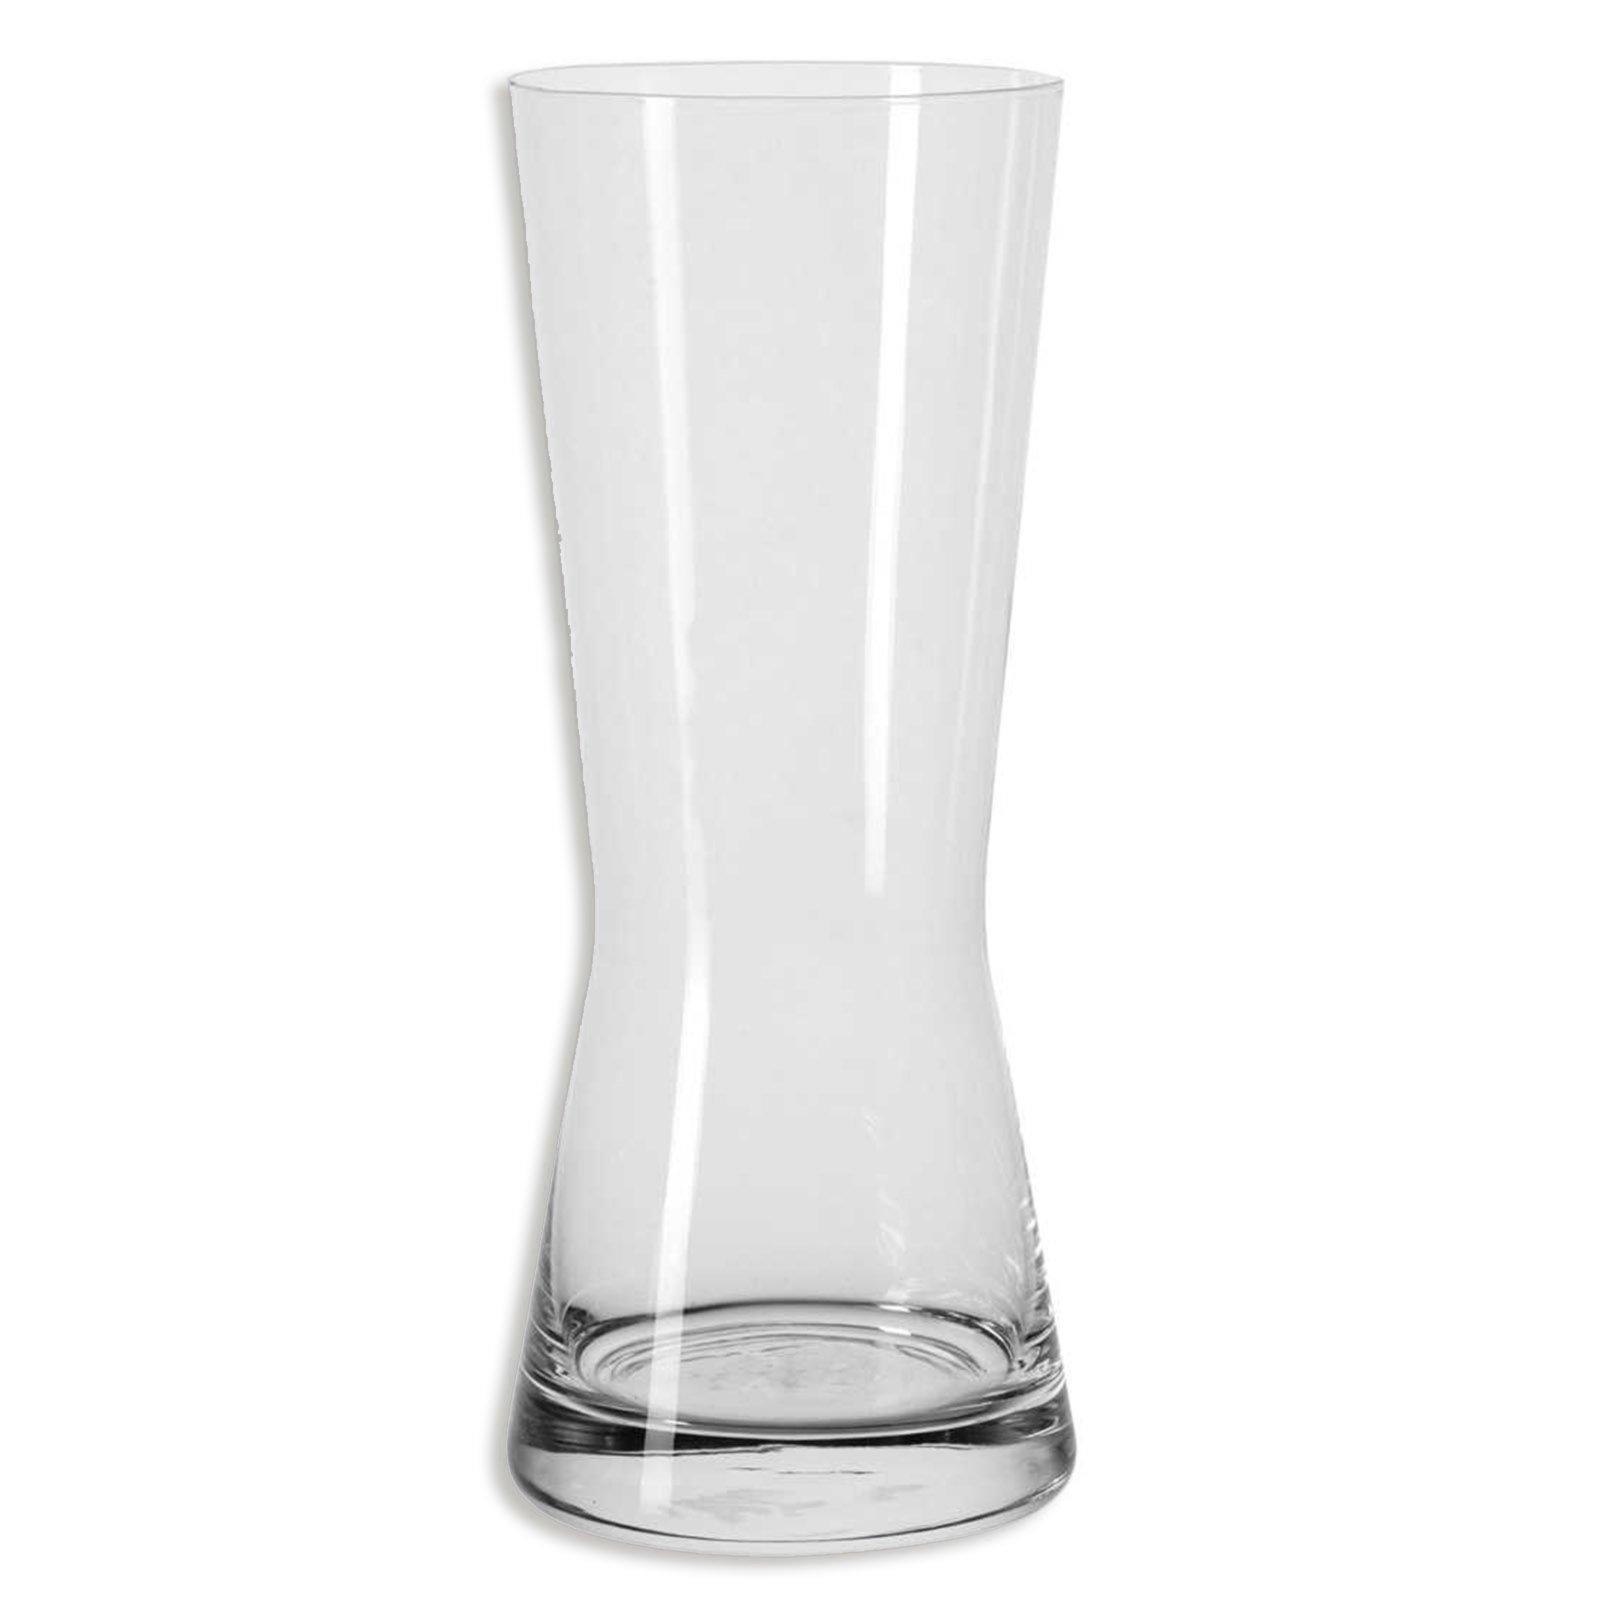 vase zoom glas 19 cm vasen deko artikel deko. Black Bedroom Furniture Sets. Home Design Ideas